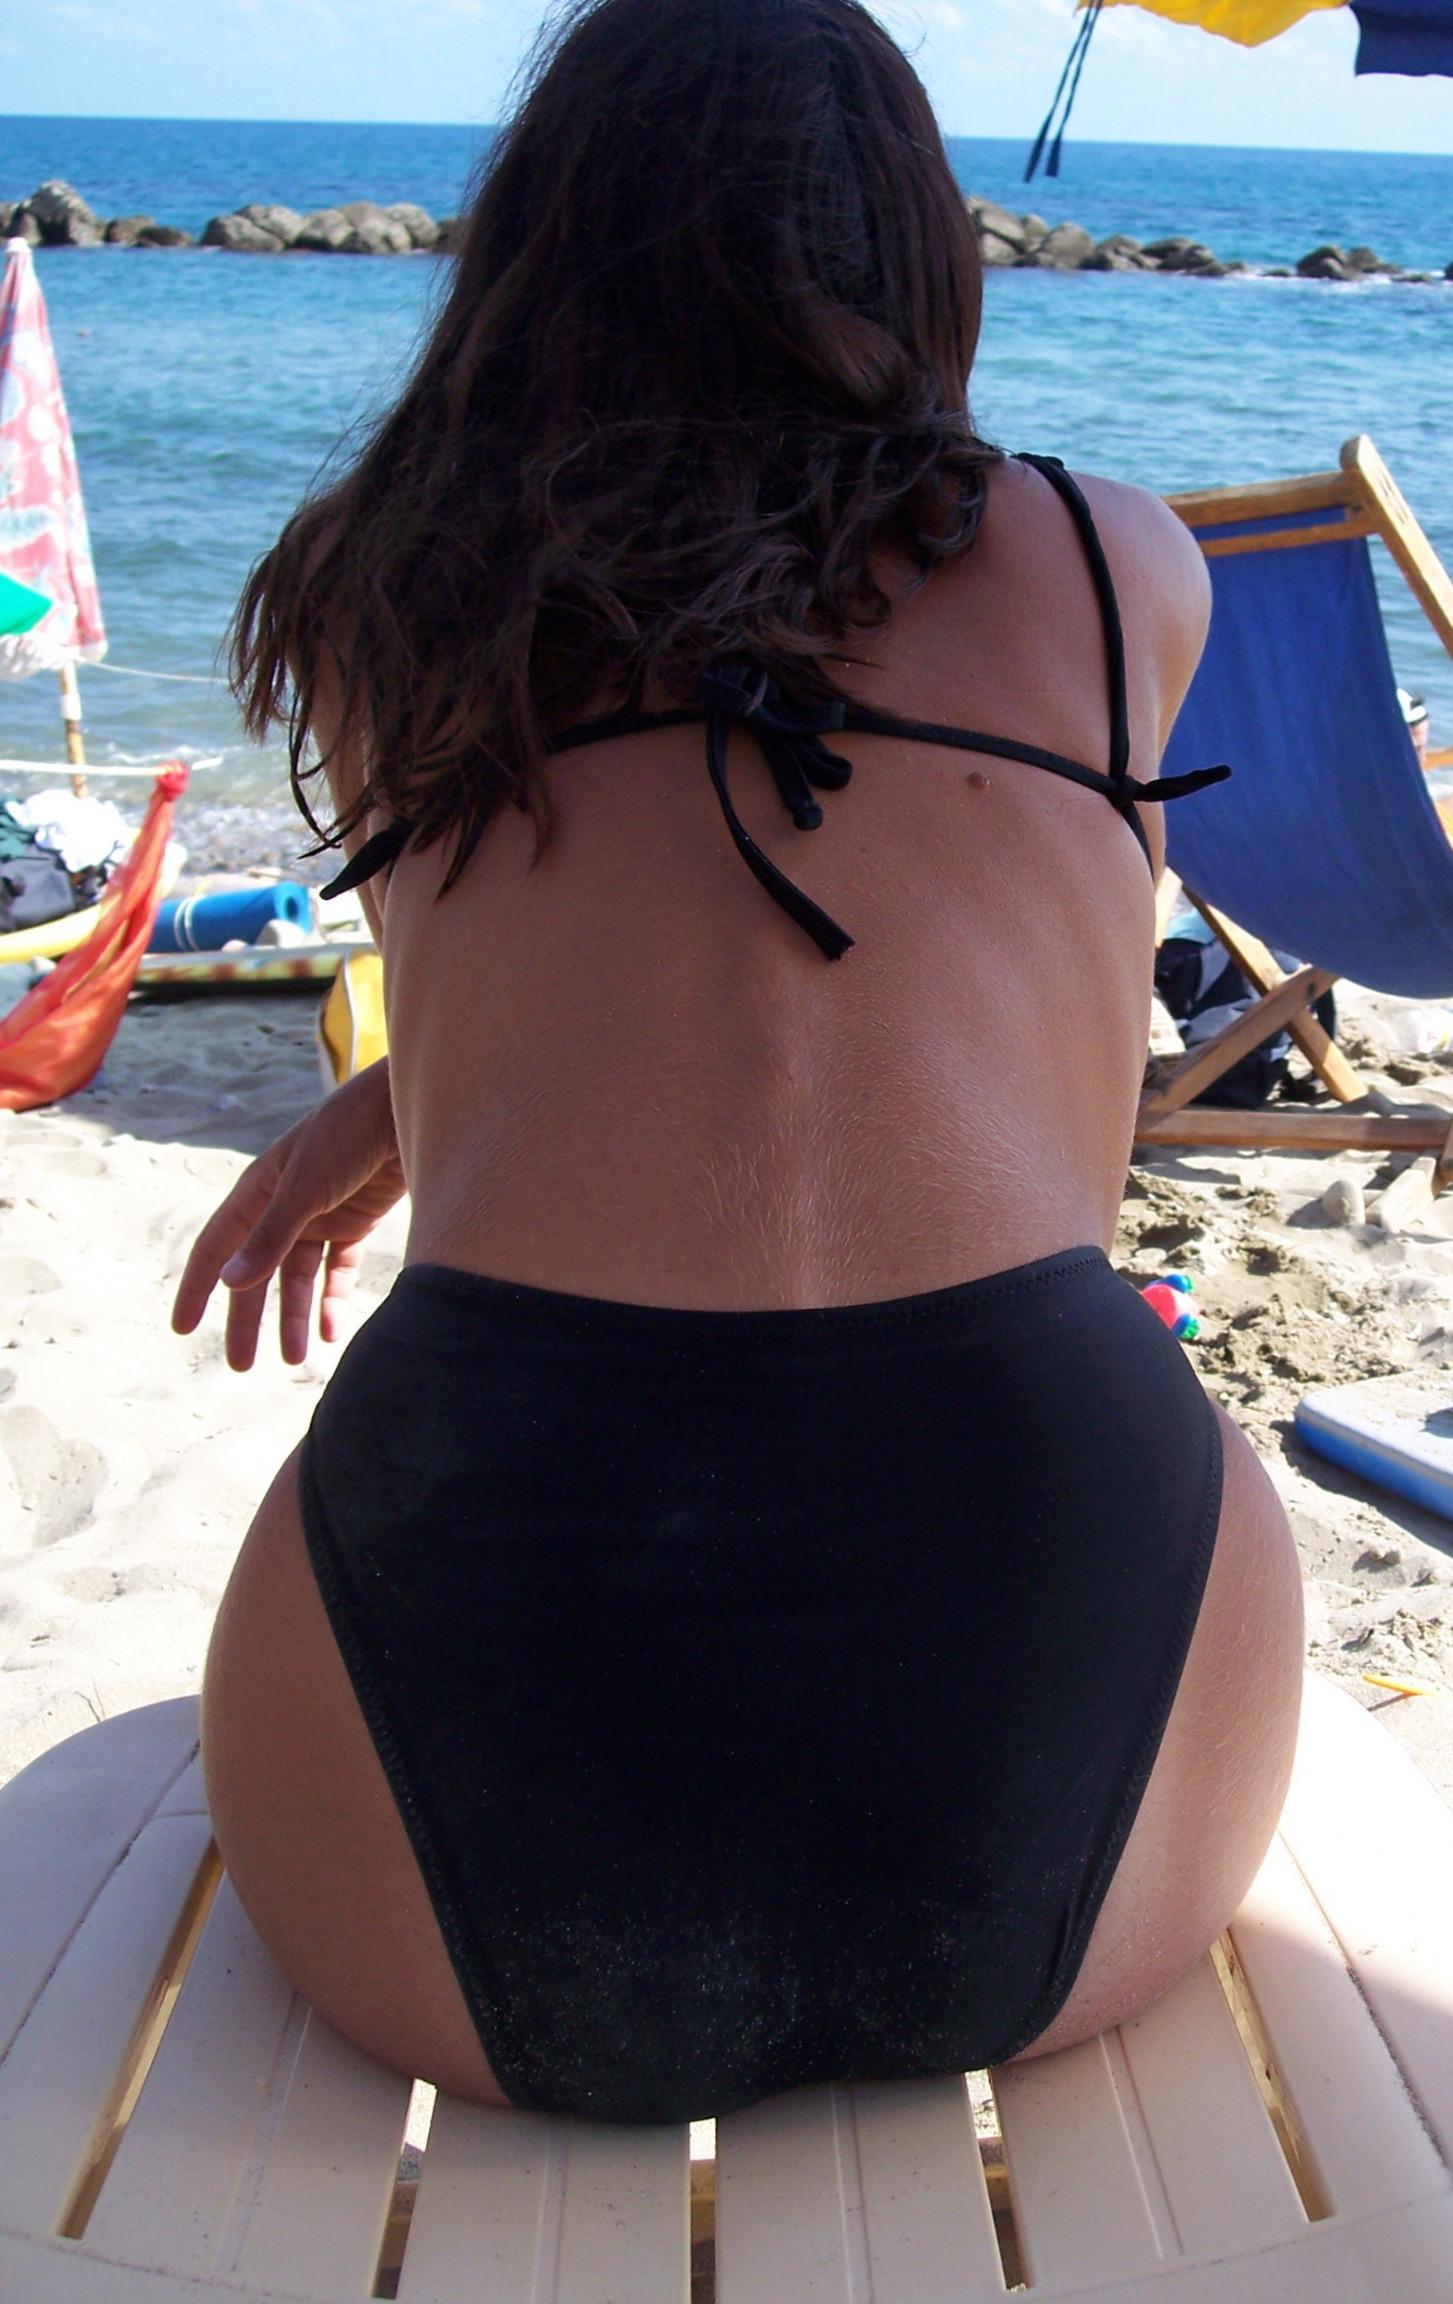 5866d203bf88 Fotos gratis : playa, niña, mujer, verano, pierna, modelo, ropa ...